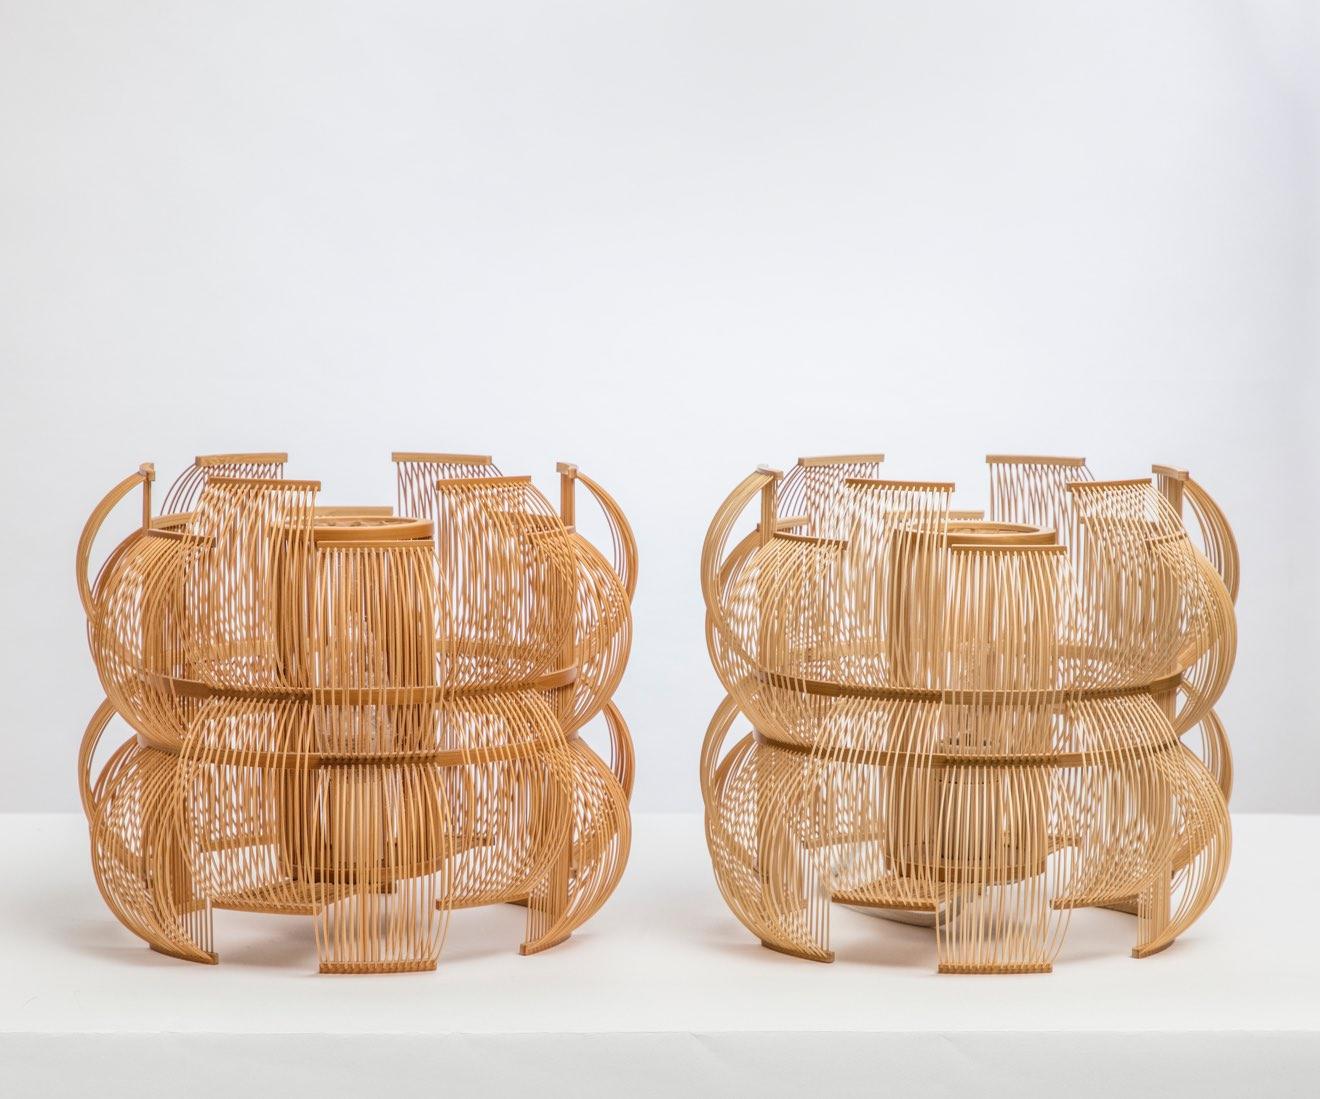 Motarasu Product - Sen table lamps by Tani Toshiyuki